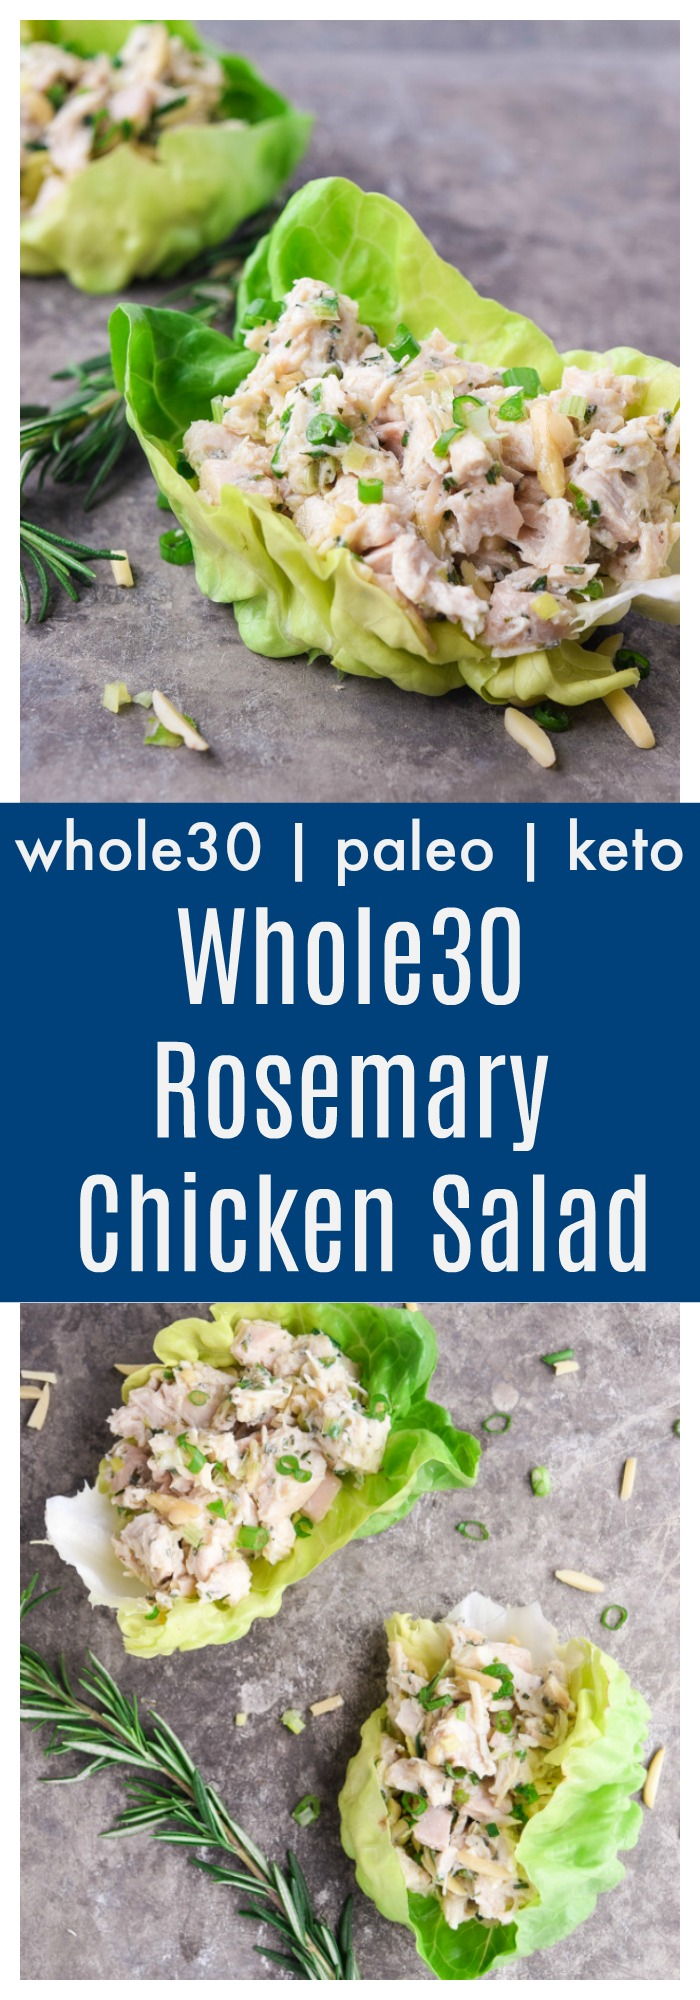 whole30 rosemary chicken salad